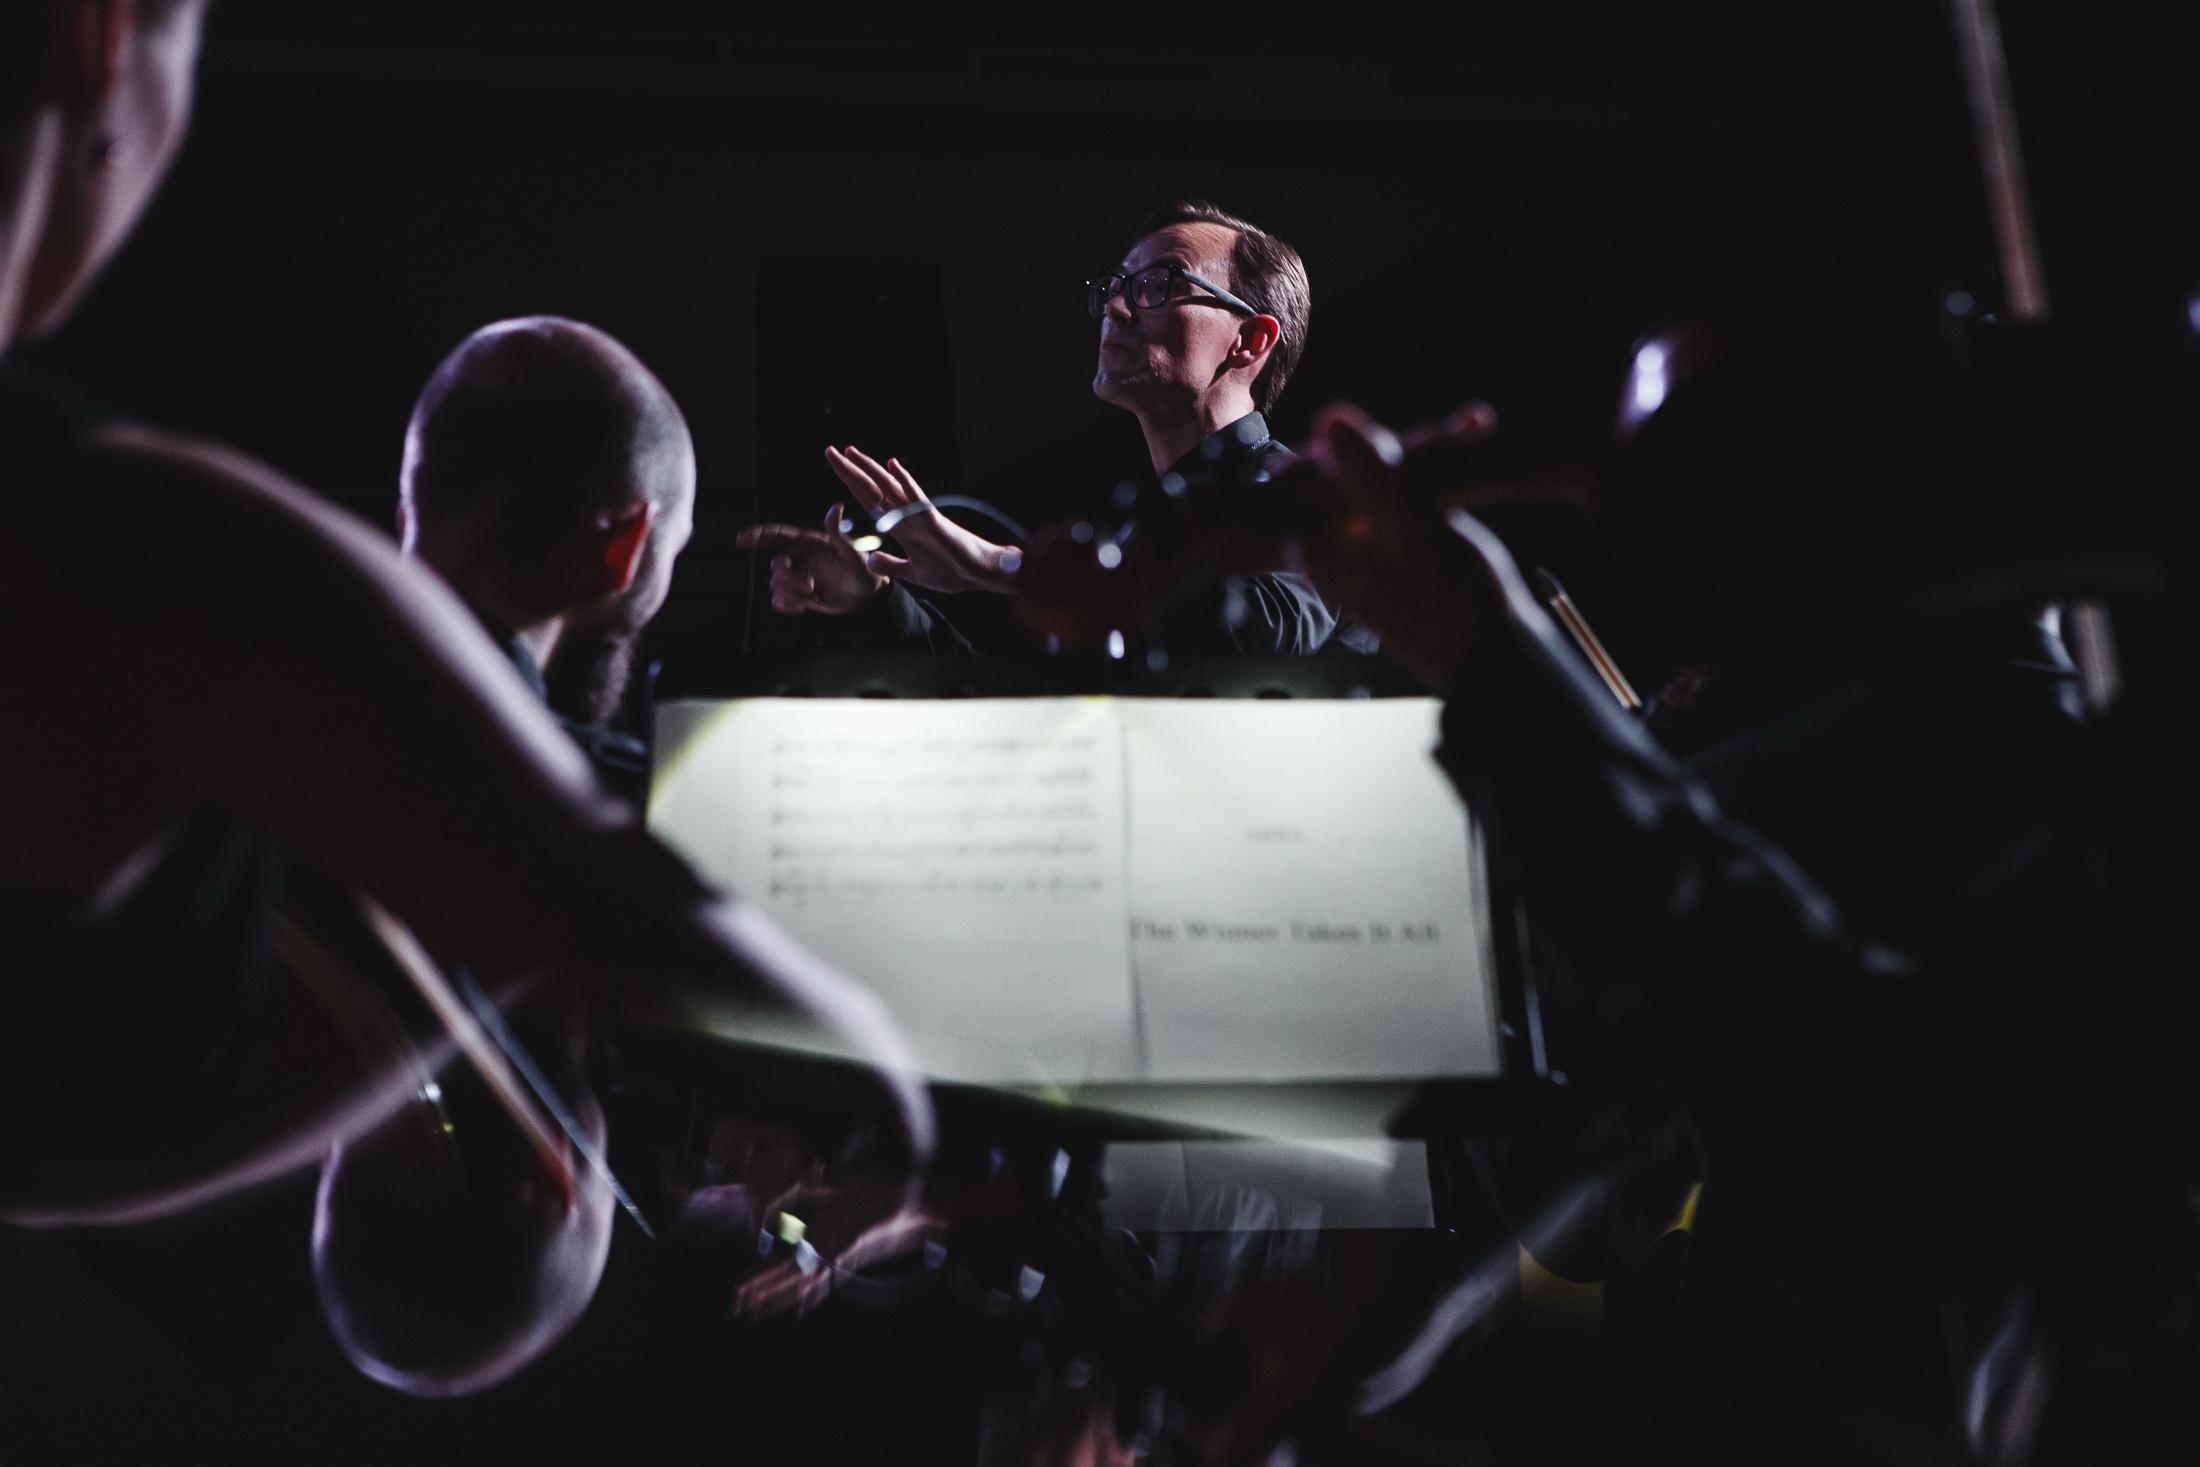 Фото с концерта Другого оркестра предоставлено организаторами